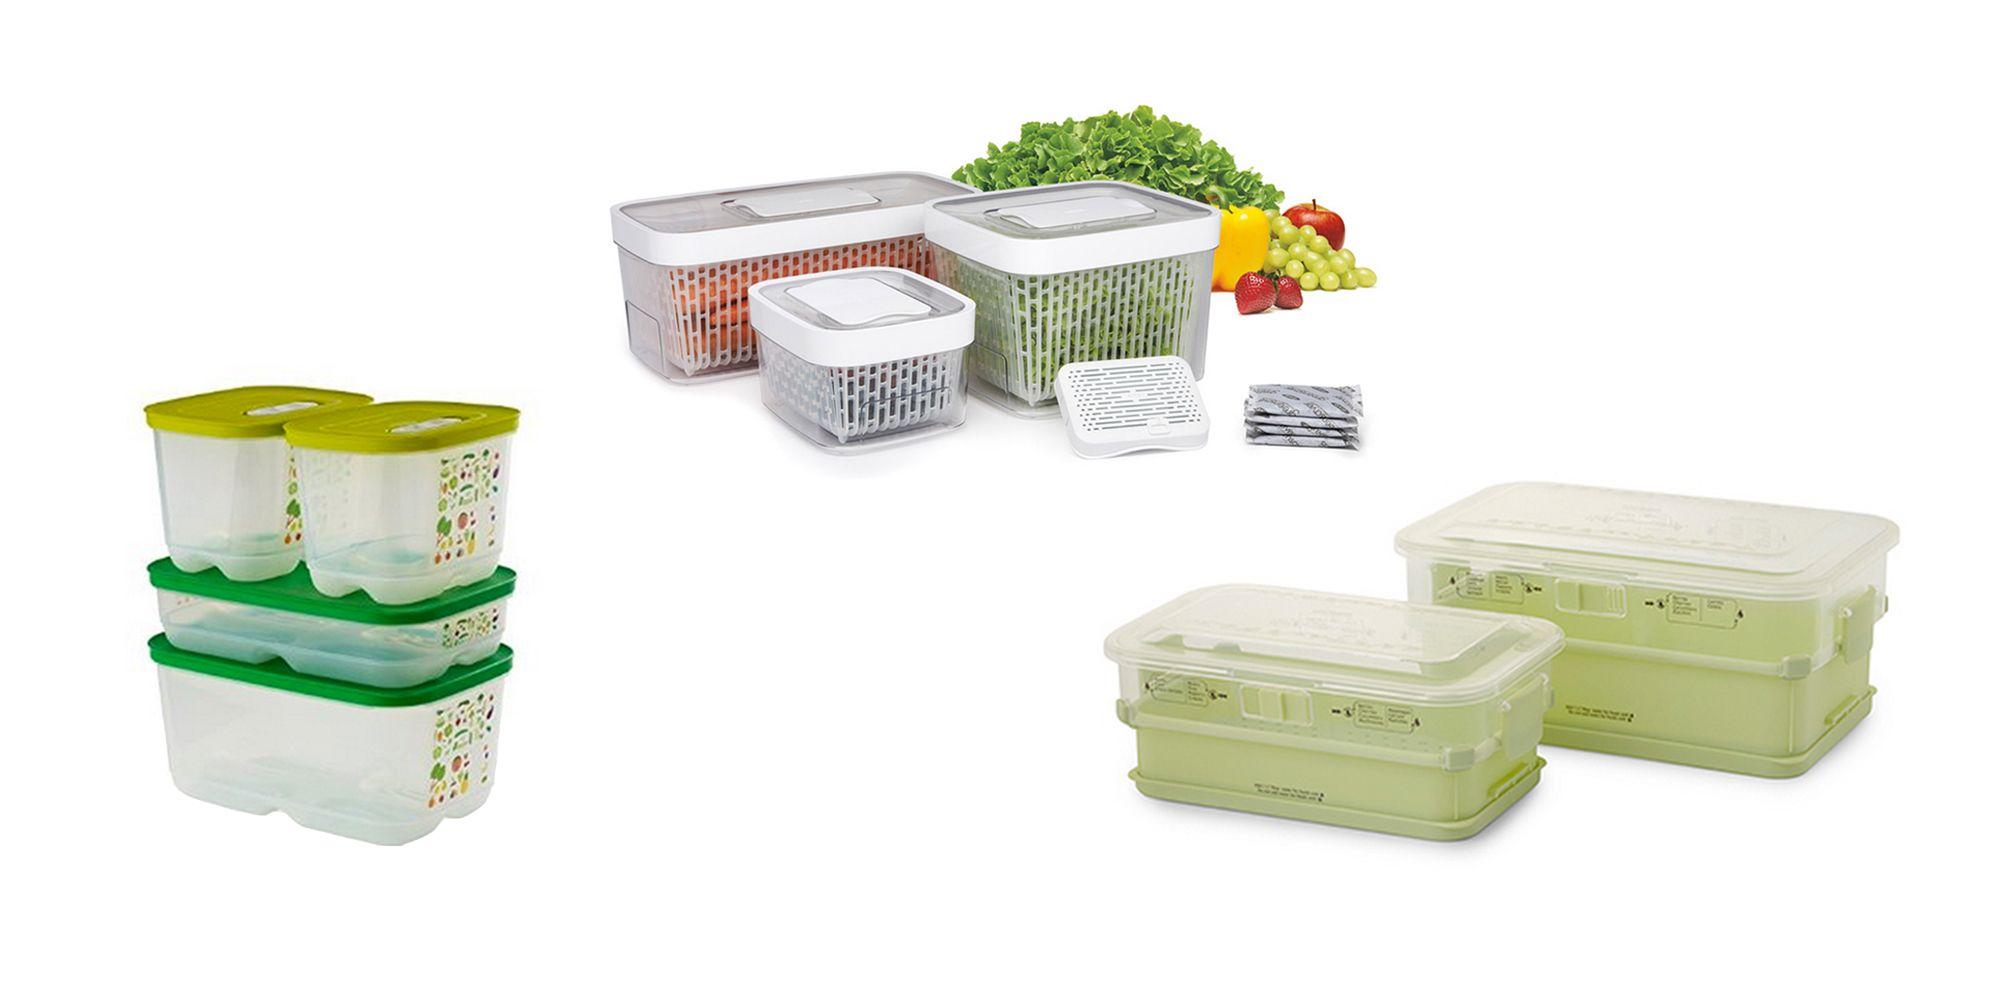 Produce Keeper Reviews Oxo Greensaver Produce Keeper Princess House Fresh Healthy Produce Keeper And Tupperware Fridgesmart